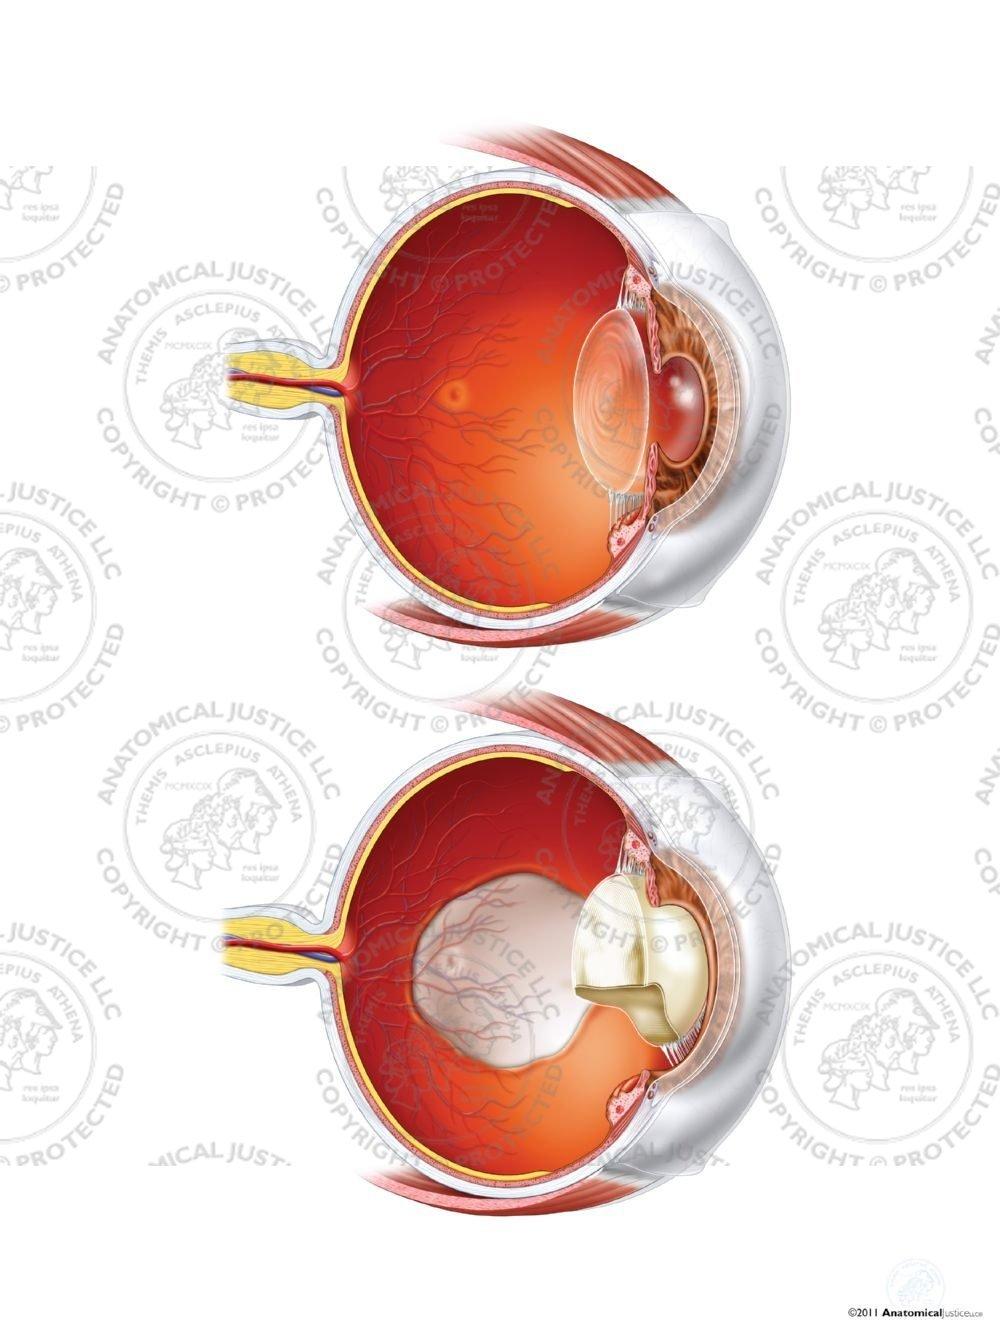 Normal Left Eye Anatomy Vs Coloboma Staphyloma And Cataract No